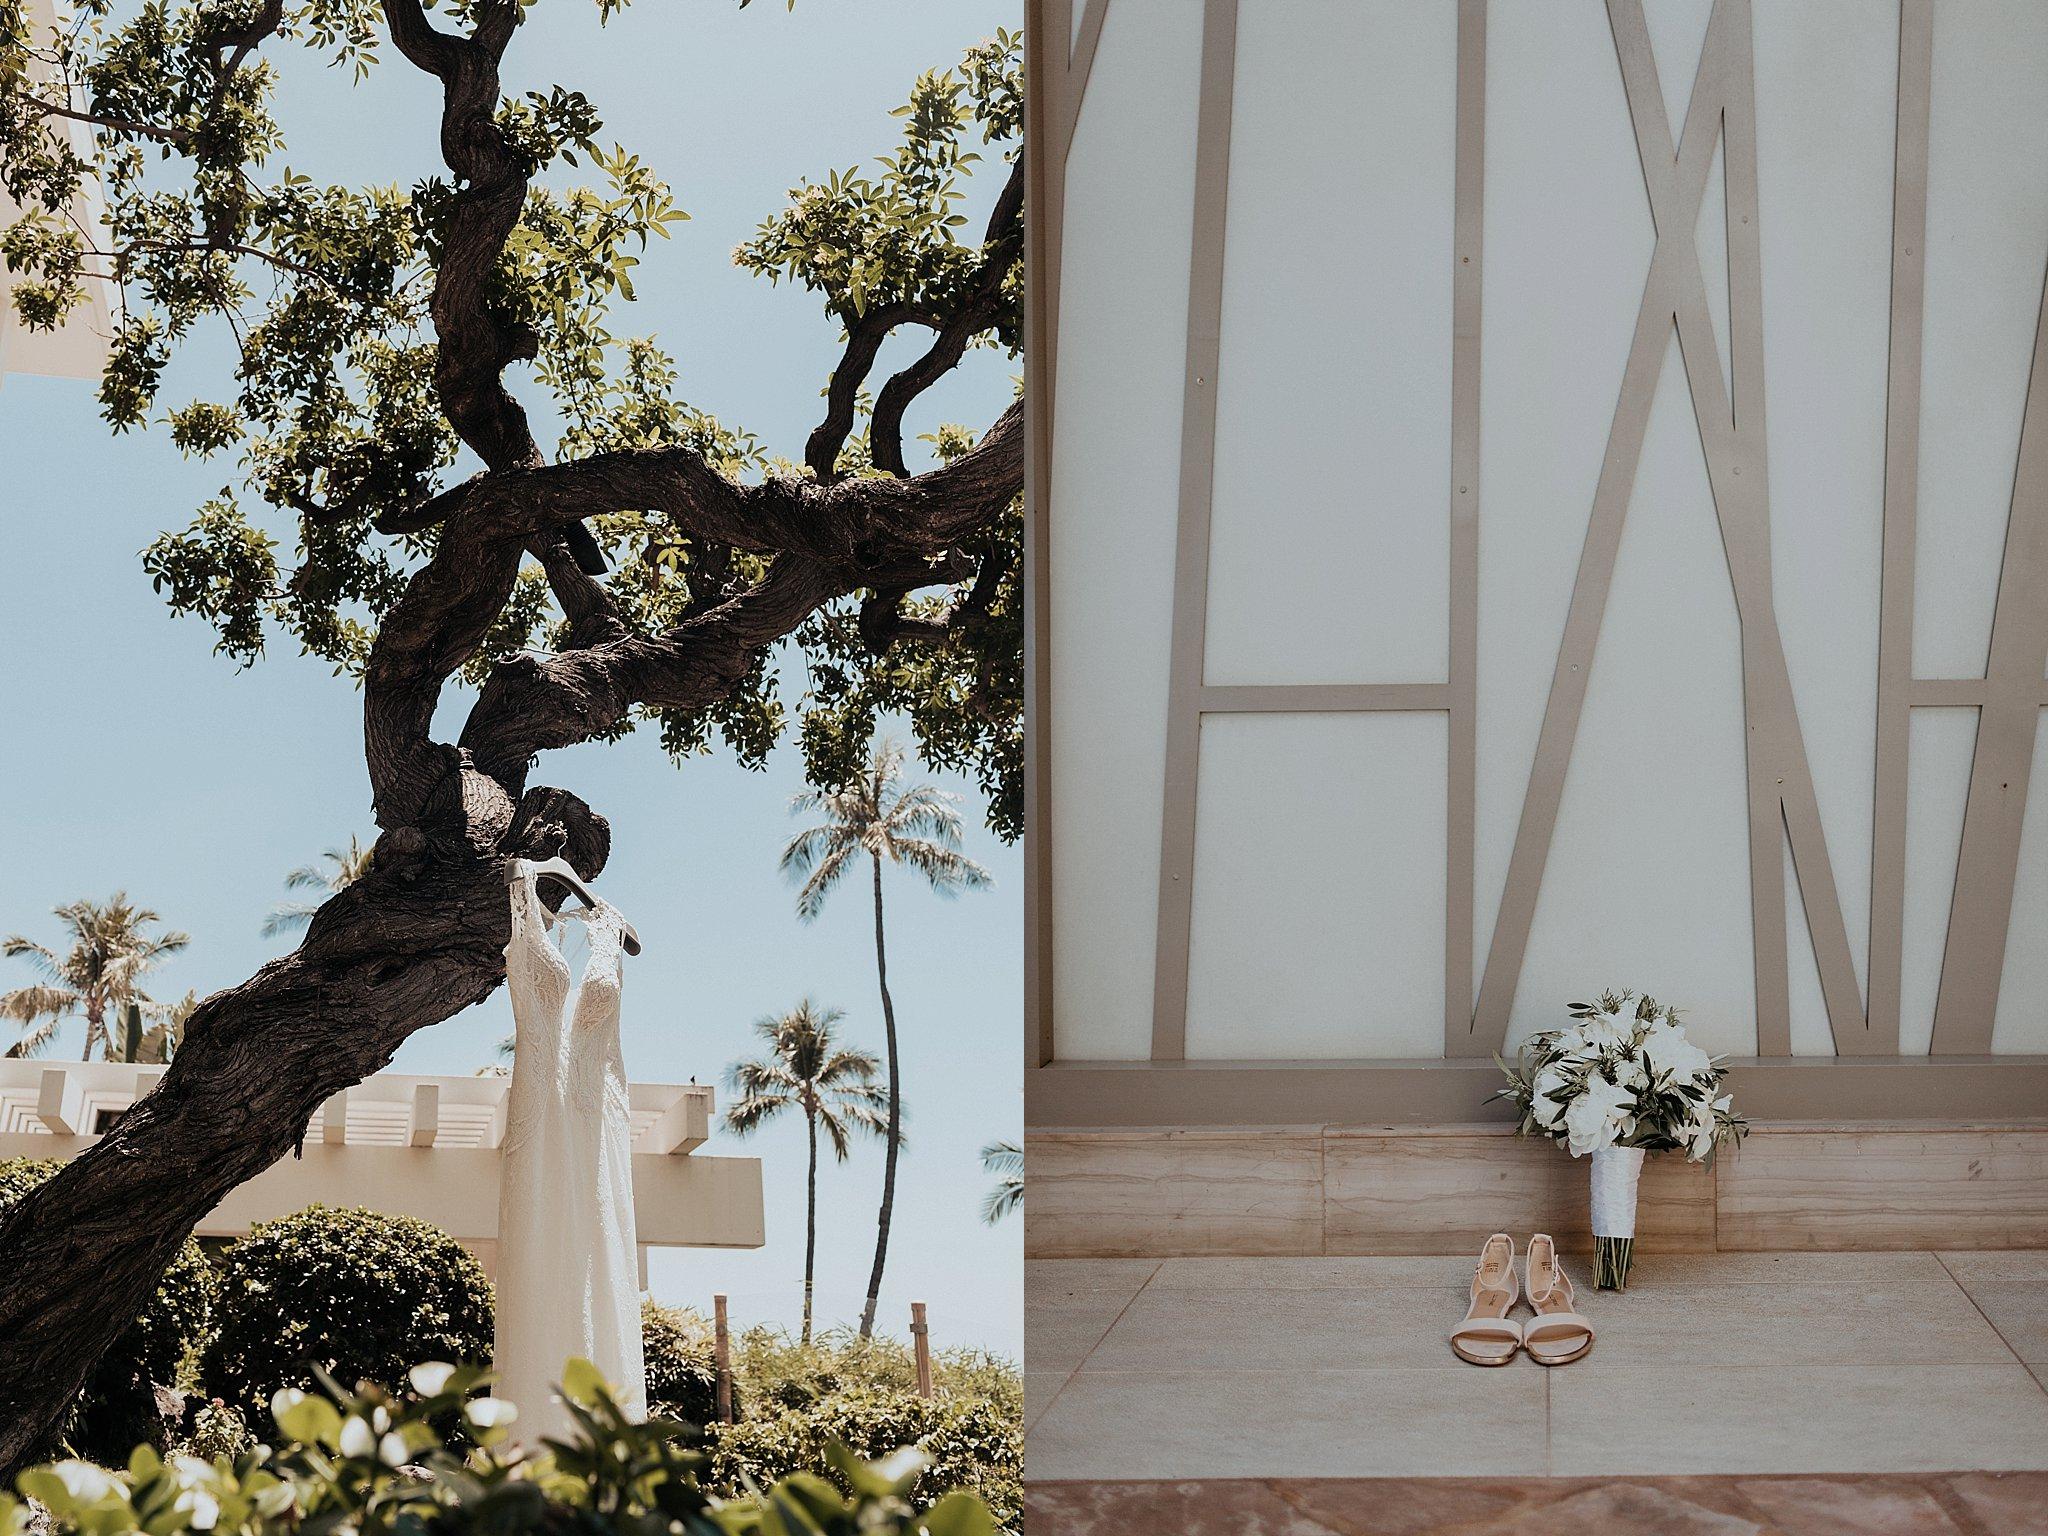 samantha_mcfarlen_bellingham_washington_engagement_photography_seattle_wedding_photographer_0147.jpg